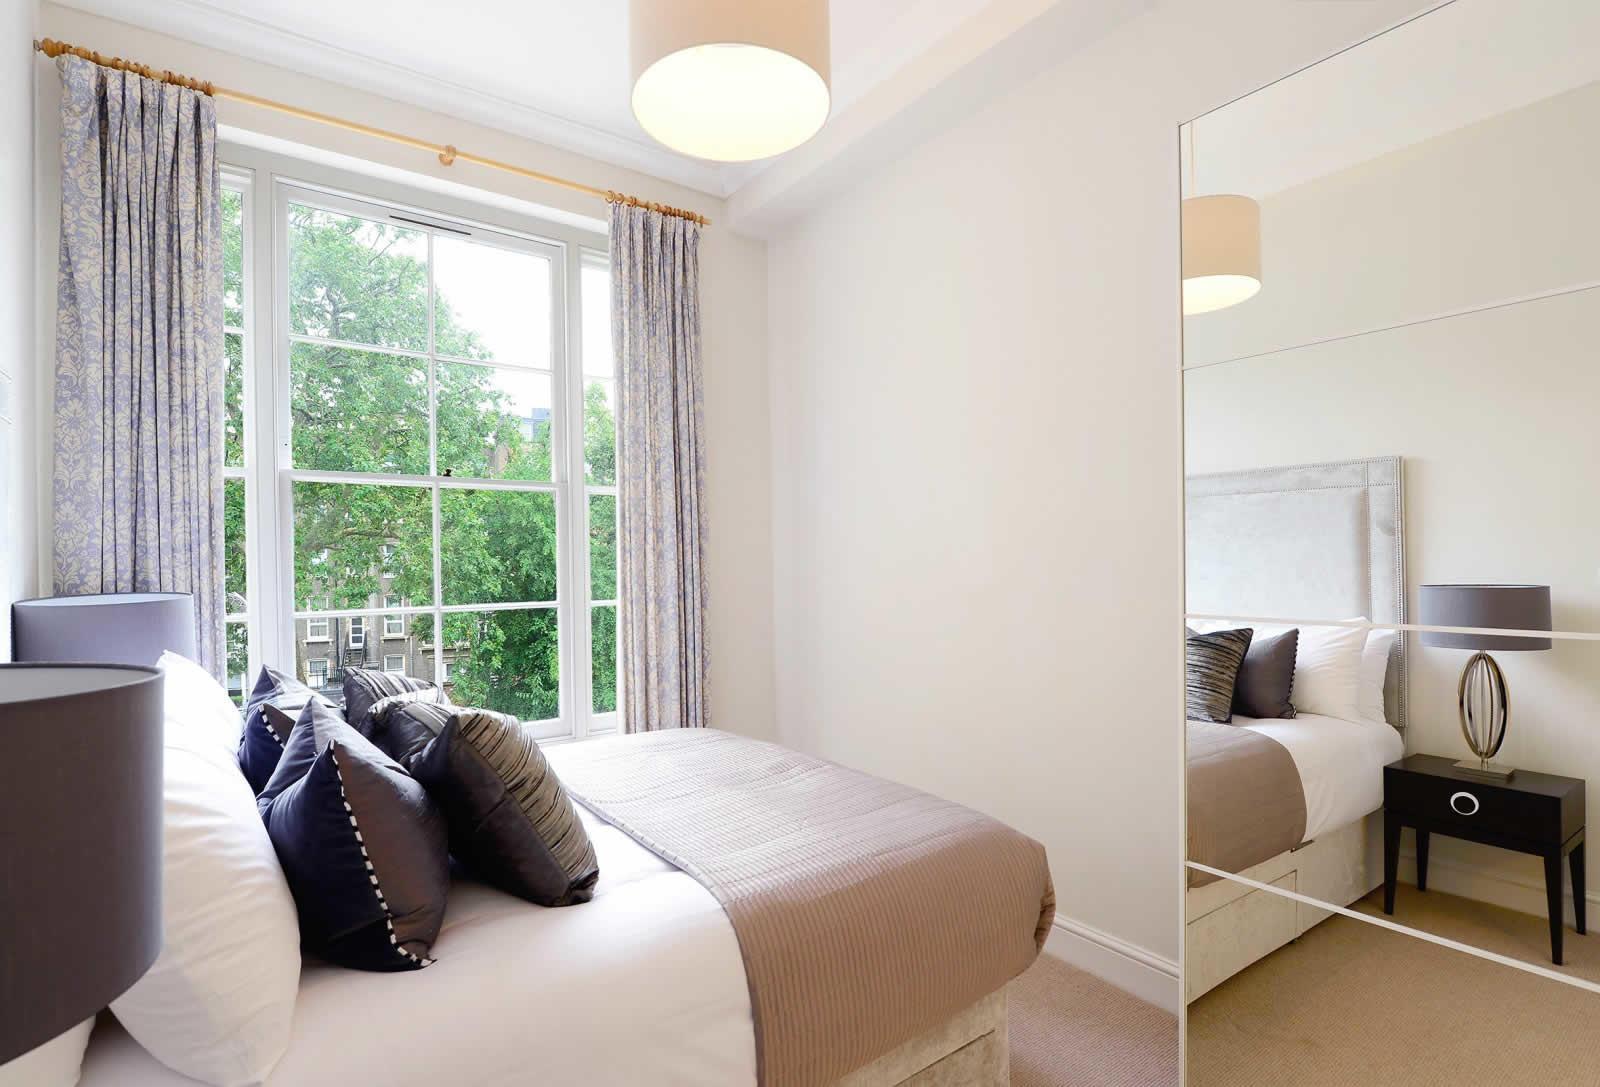 appartement-meuble-a-louer-kensingtonappartement-meuble-a-louer-kensington